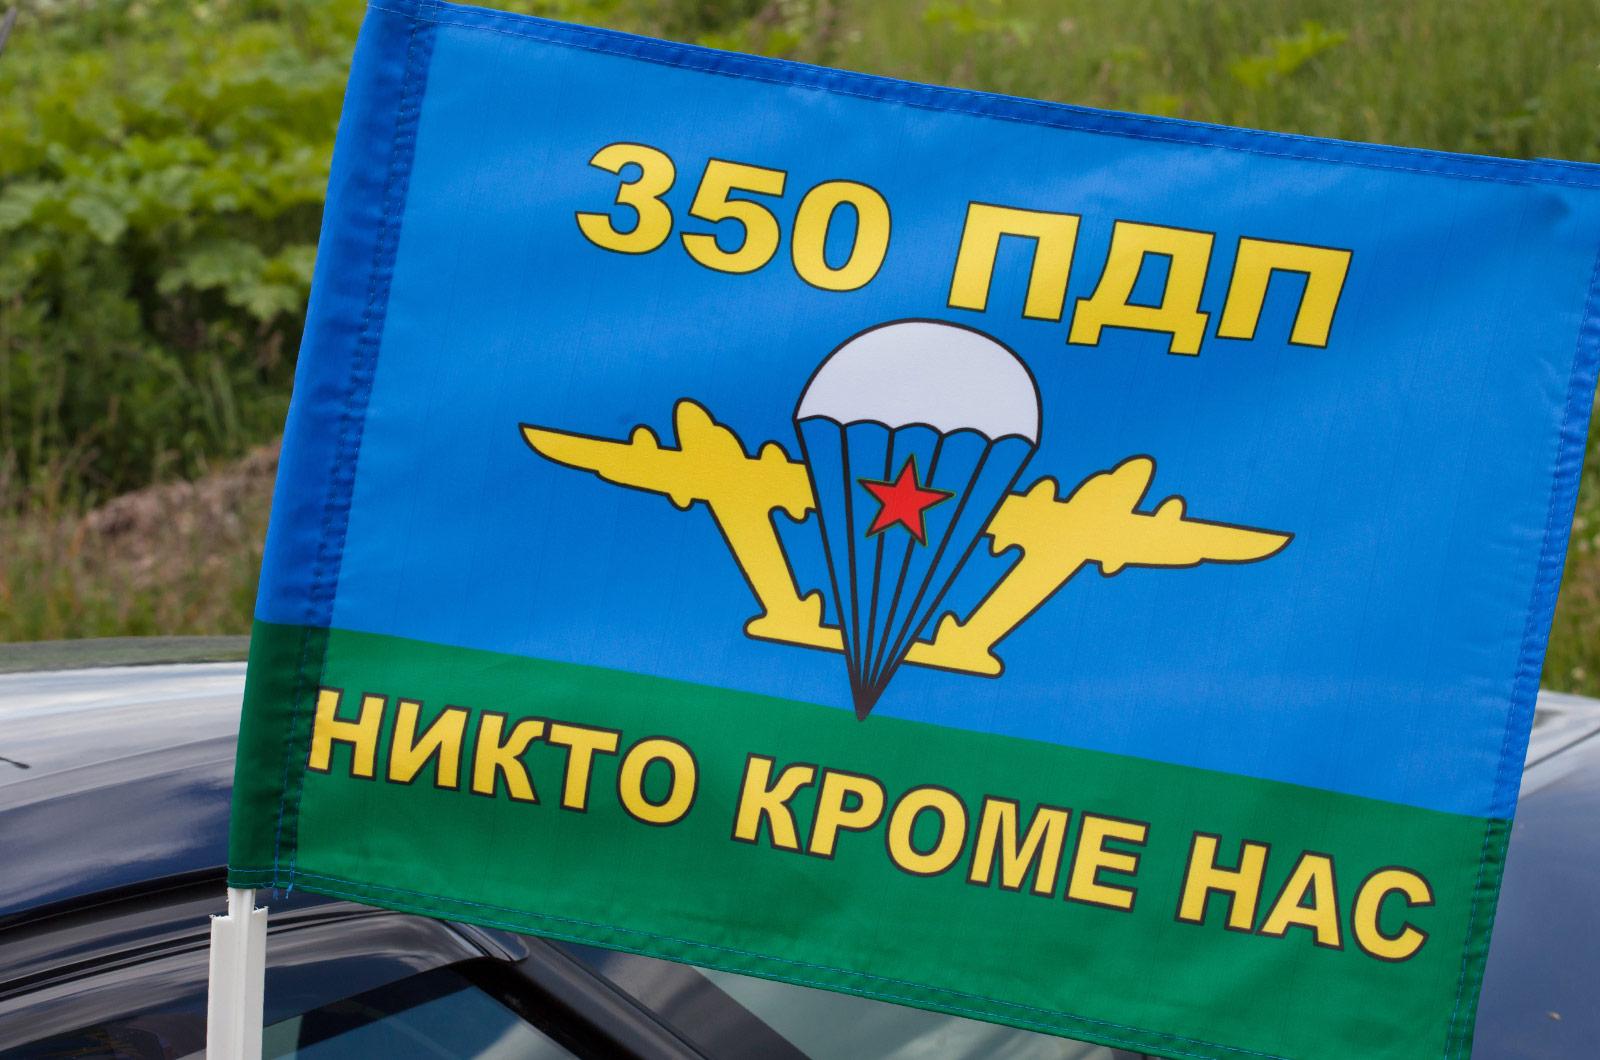 Флаг на машину с кронштейном 350 ПДП ВДВ